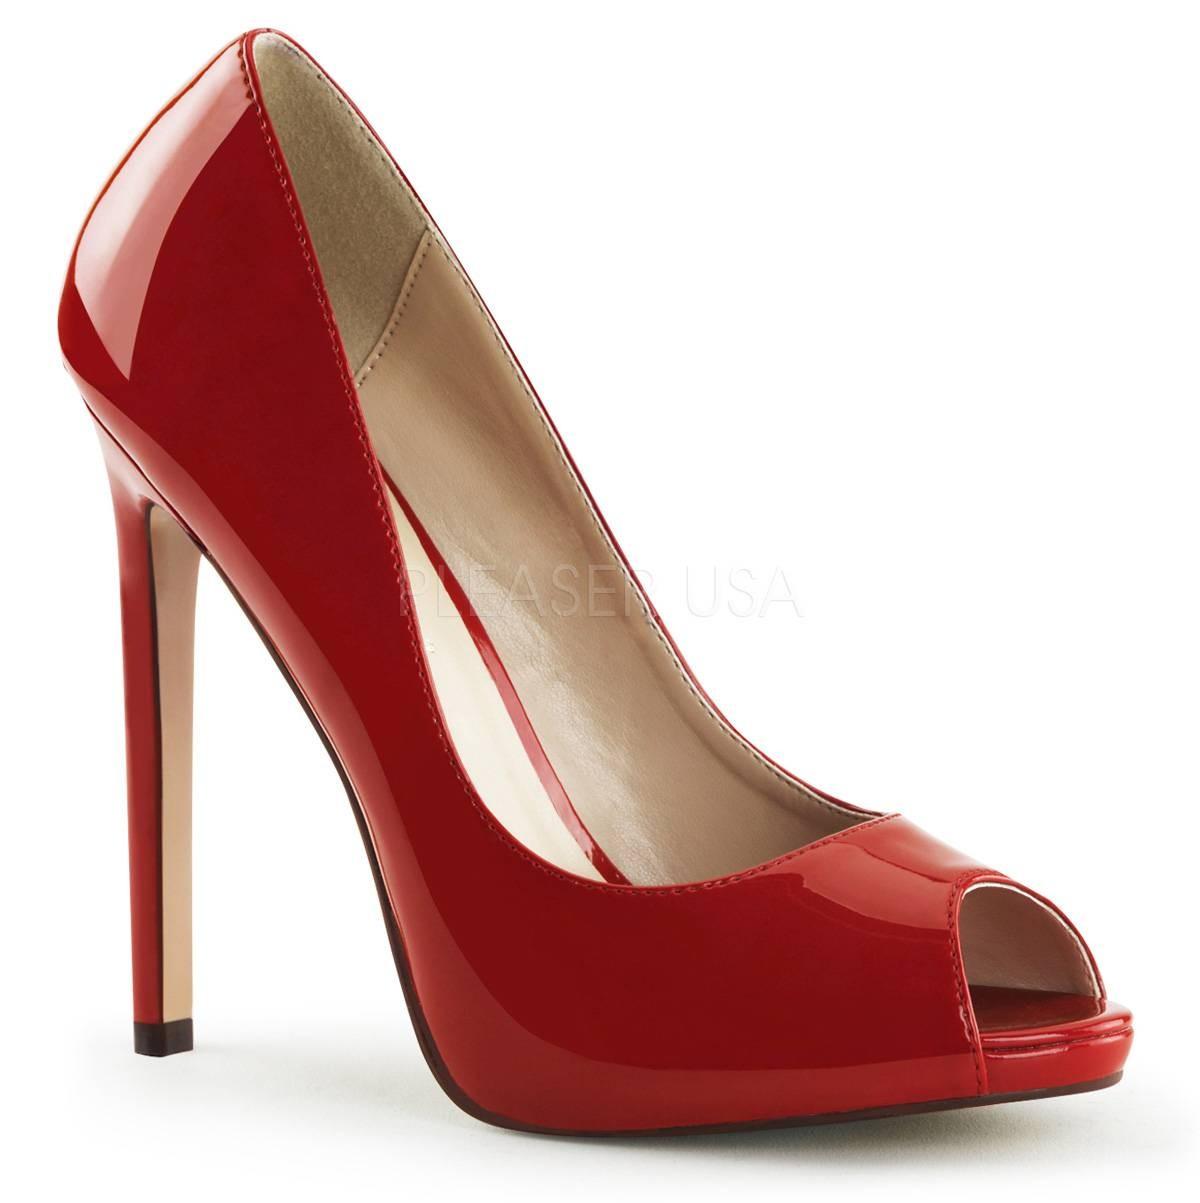 Highheels - SEXY 42 ° Damen Peep Toe ° Rot Glänzend ° Pleaser  - Onlineshop RedSixty